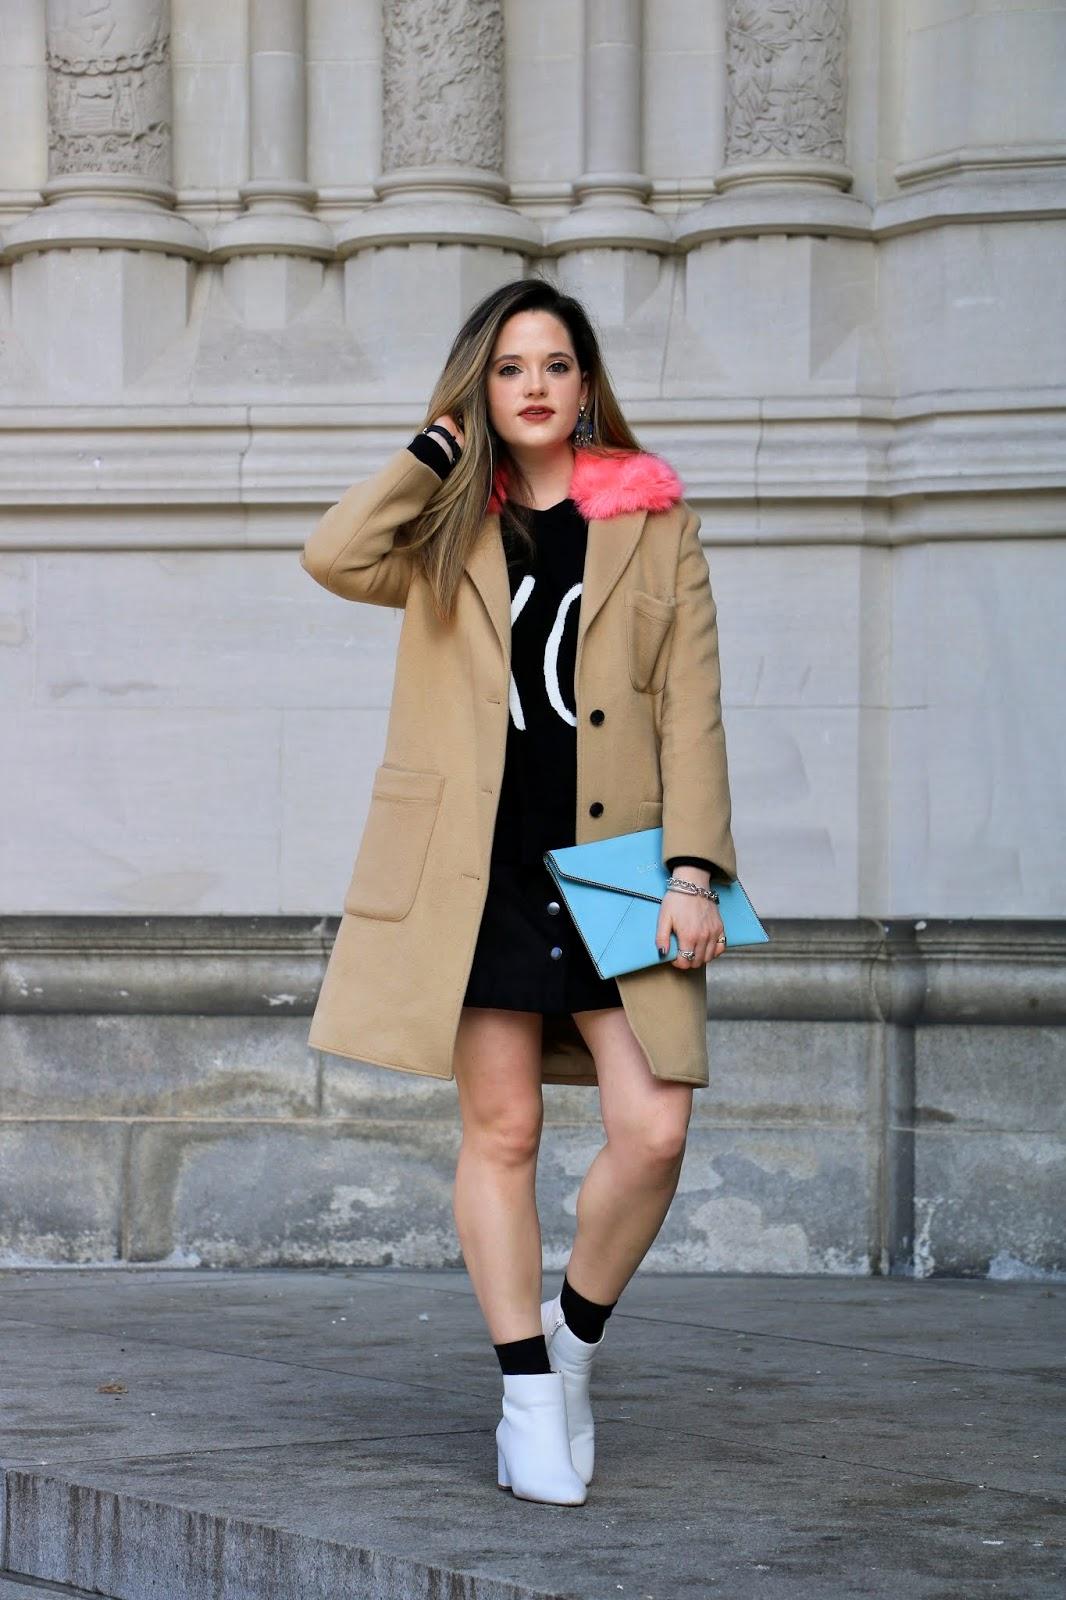 Nyc fashion blogger Kathleen Harper's 2019 nyfw street style